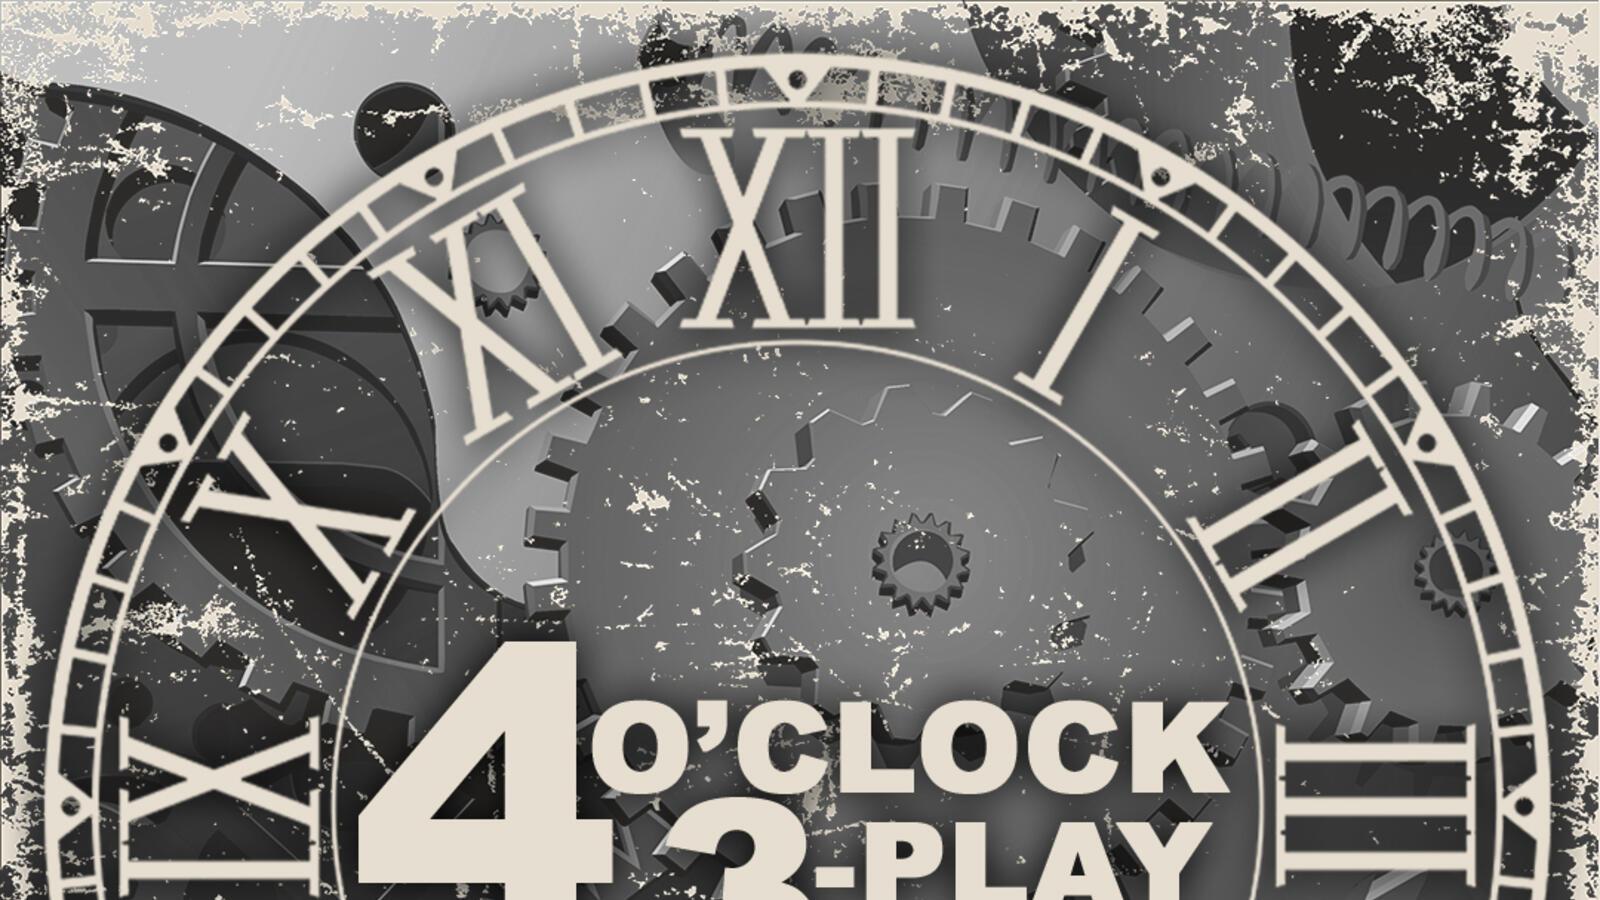 Jeff K's 4 O'Clock 3 Play - 9/23/21